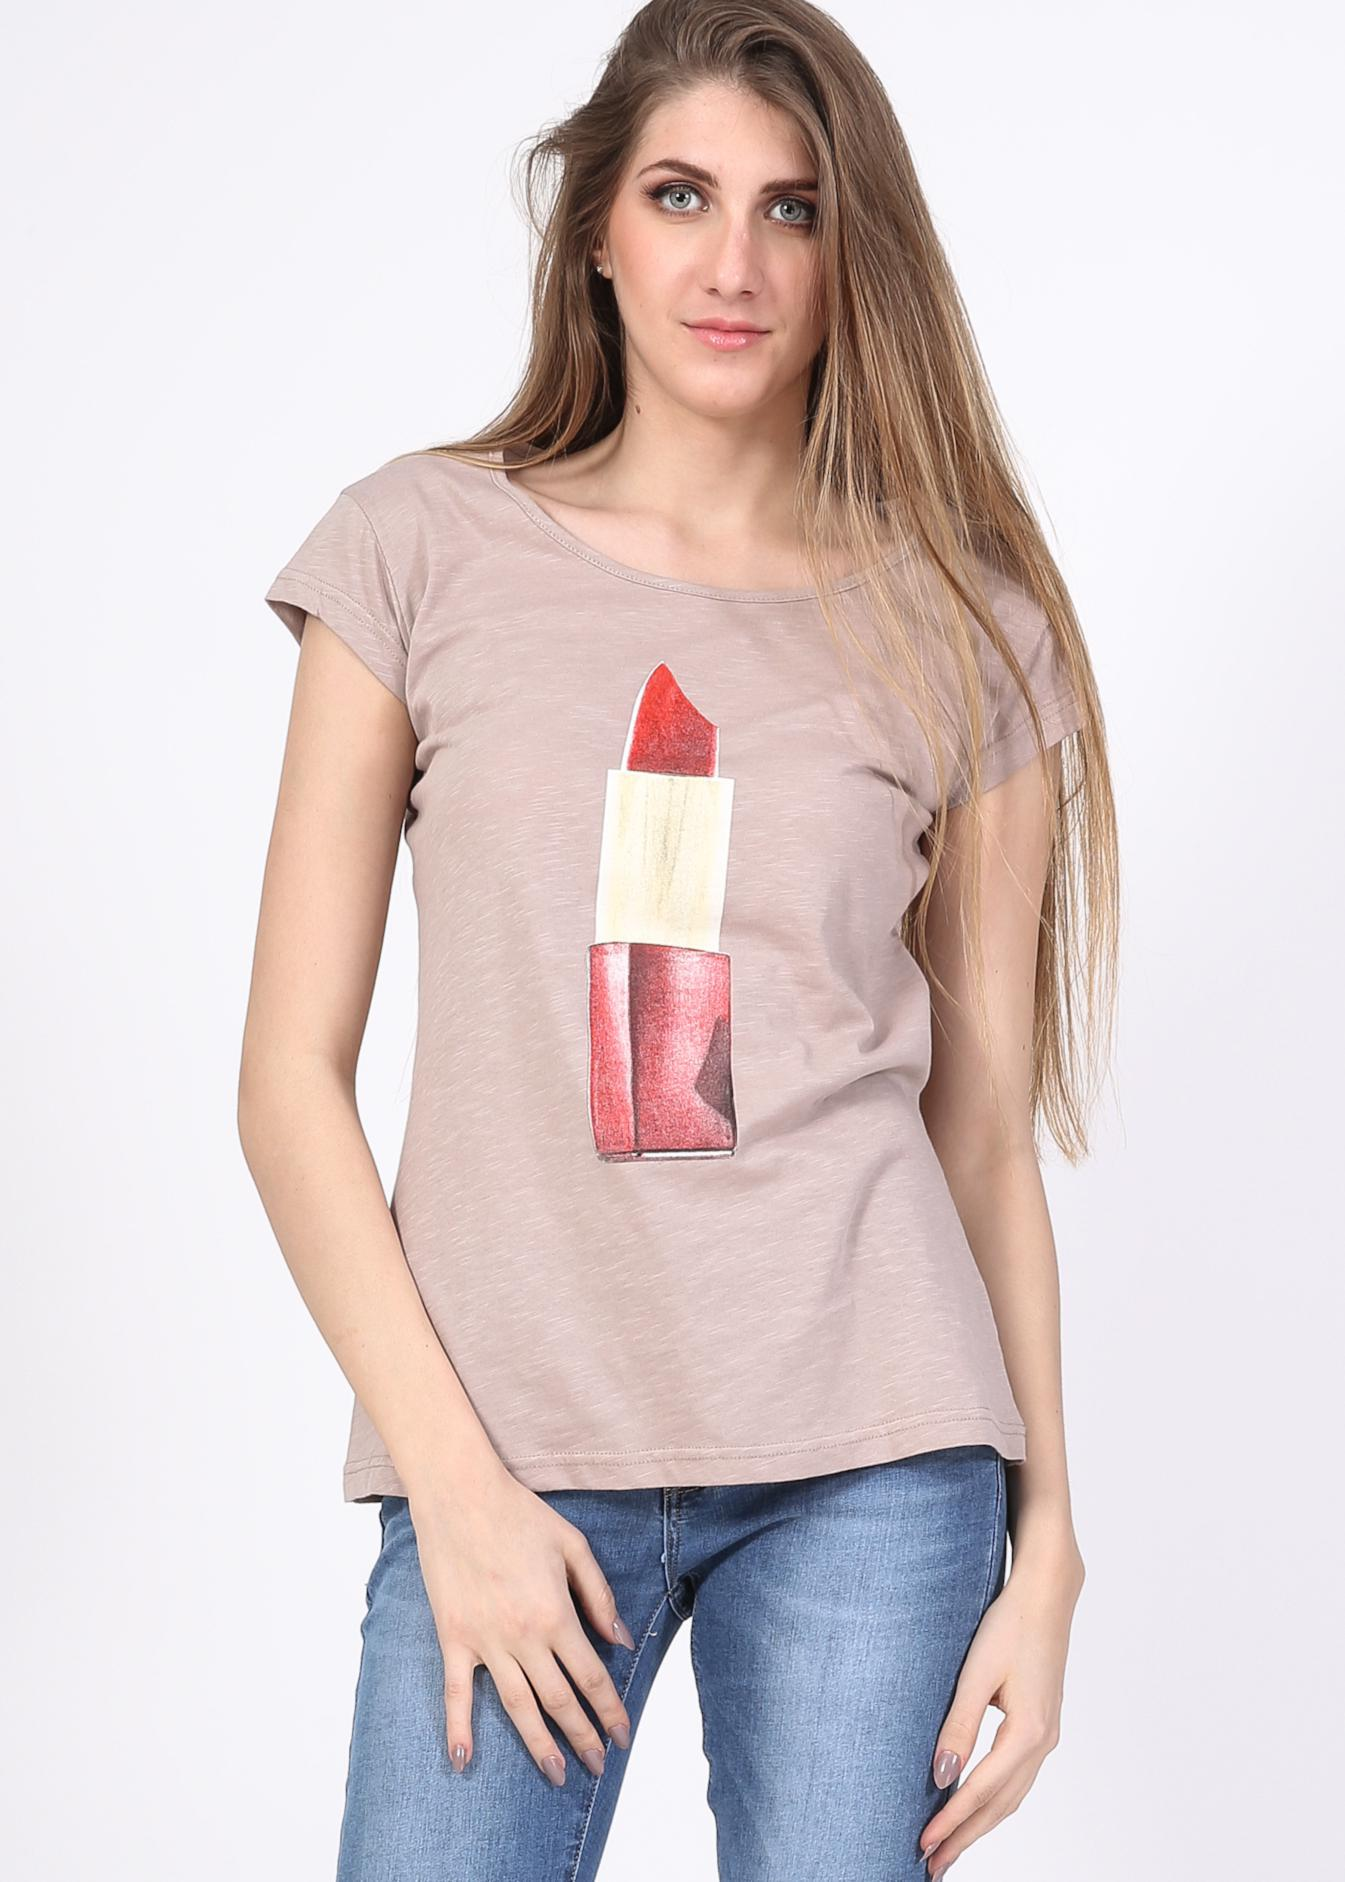 Colette t-shirt, πούρο ρούχα